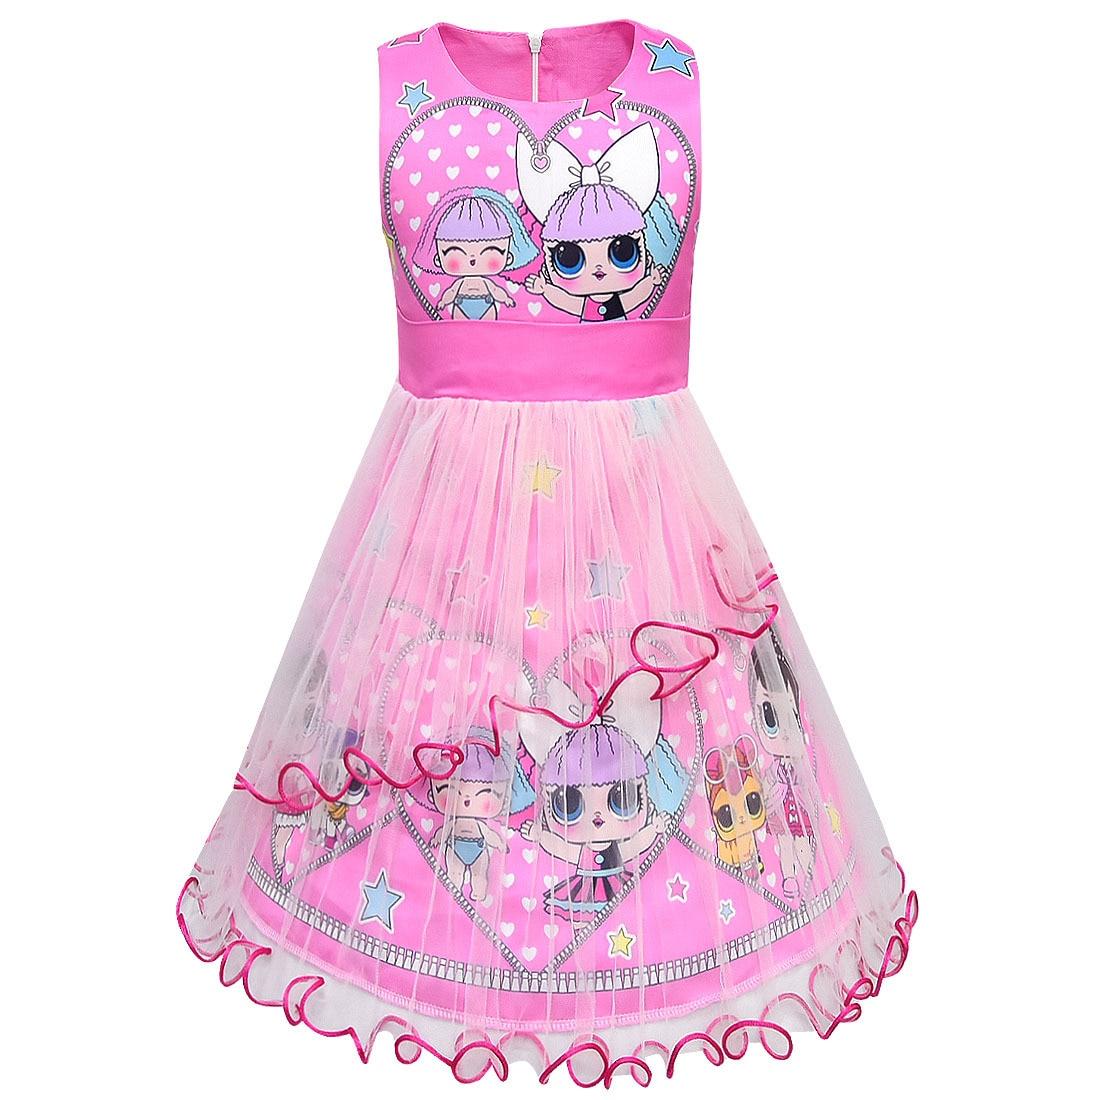 LOL Original Surprise Dolls Figure Girls Lol Dolls Dress Cute Kids Party Dresses Kids Elegant Girl Lol Surprise Figures Party